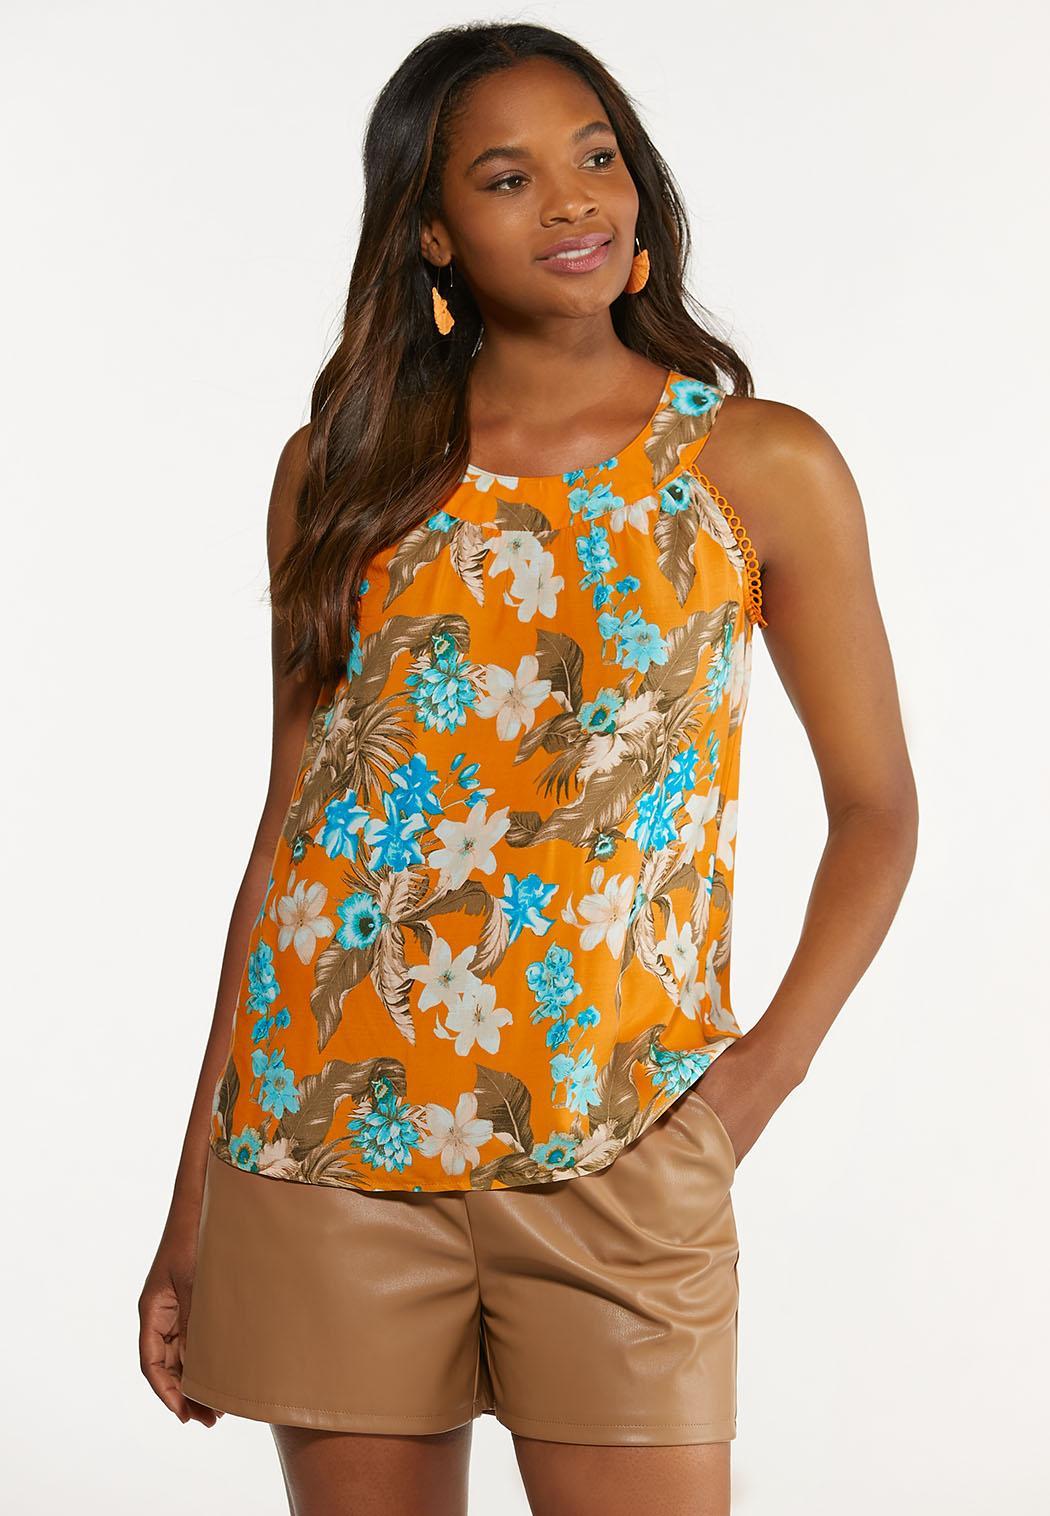 Apricot Floral Top